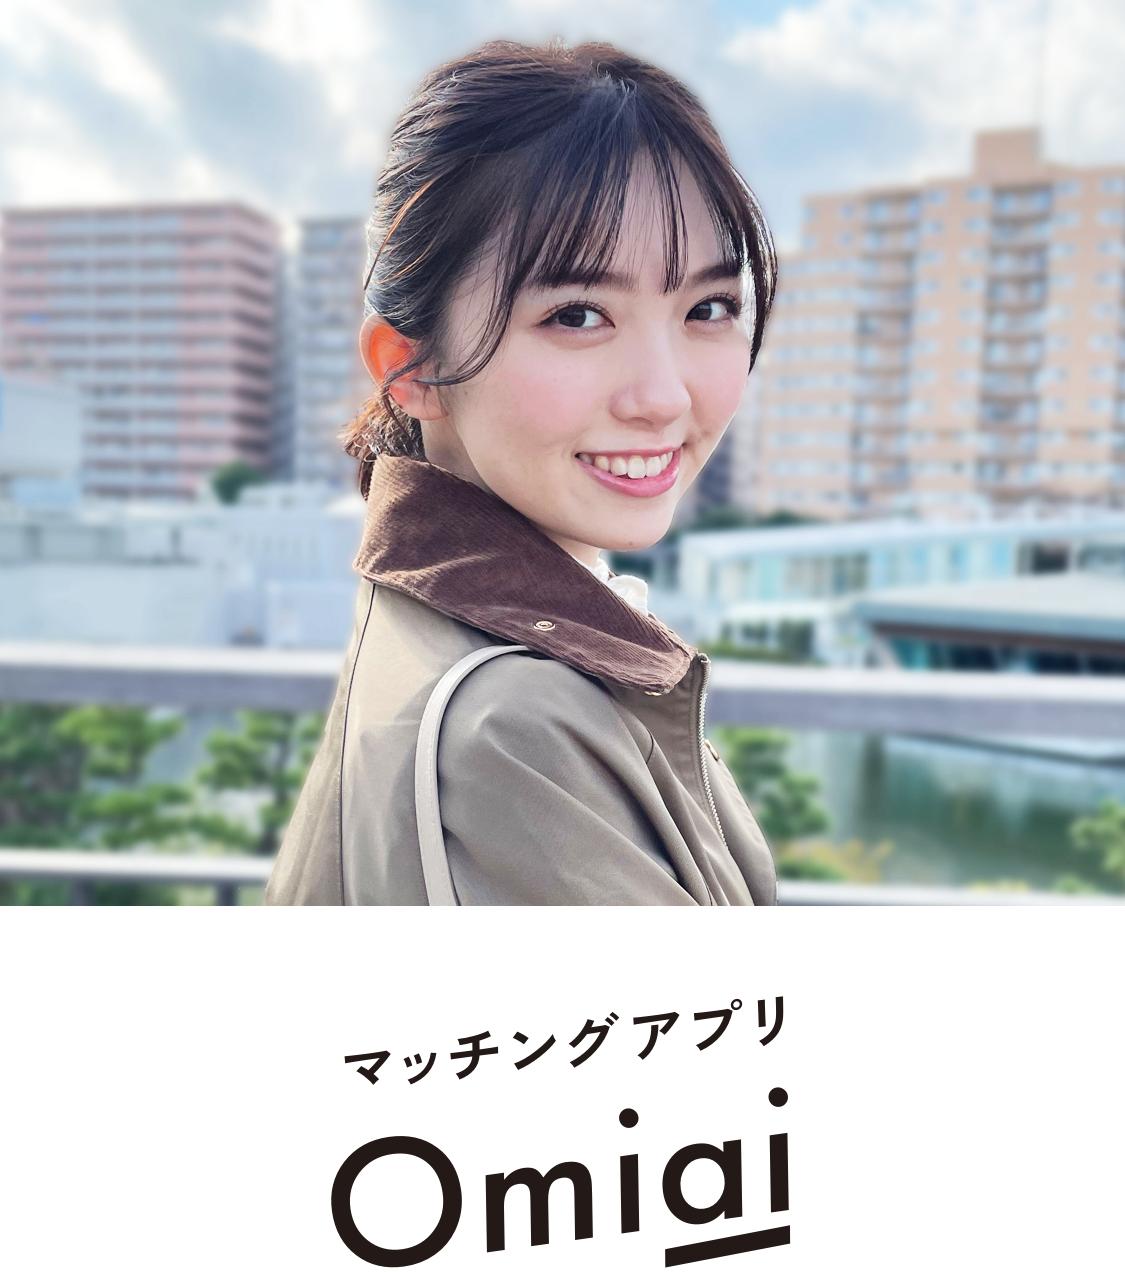 Omiai(お見合い) - 恋活・婚活マッチングアプリ   一部上場企業運営 ...